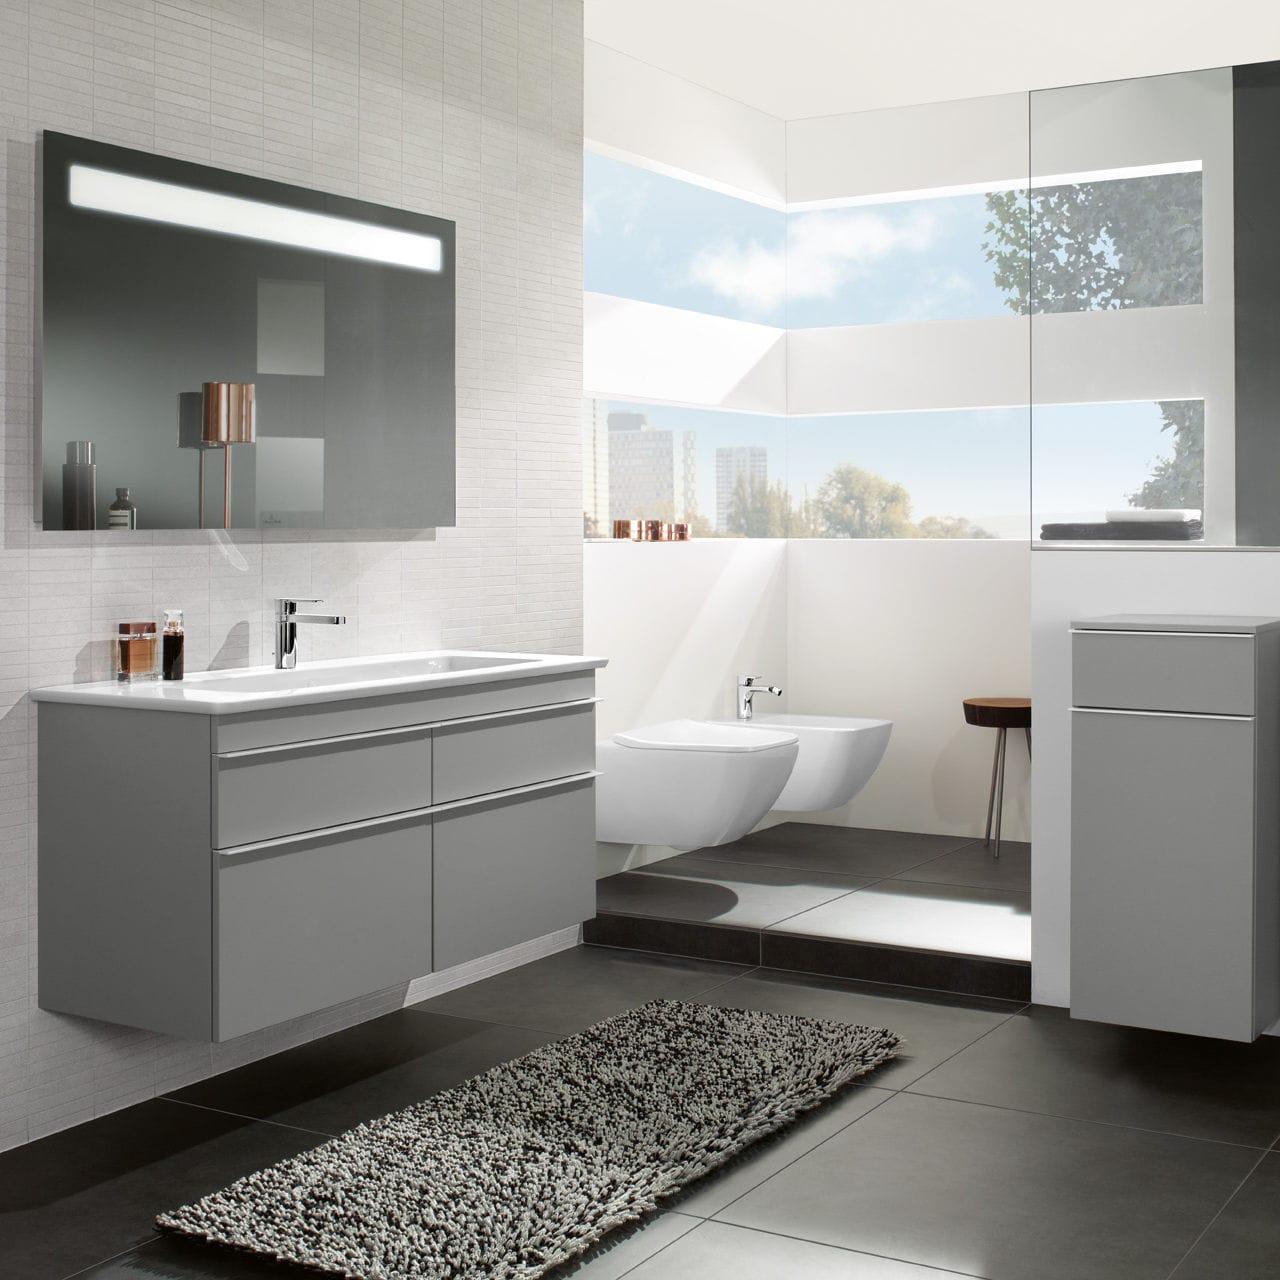 Modernes Badezimmer / Keramik - VENTICELLO - Villeroy & Boch - Videos